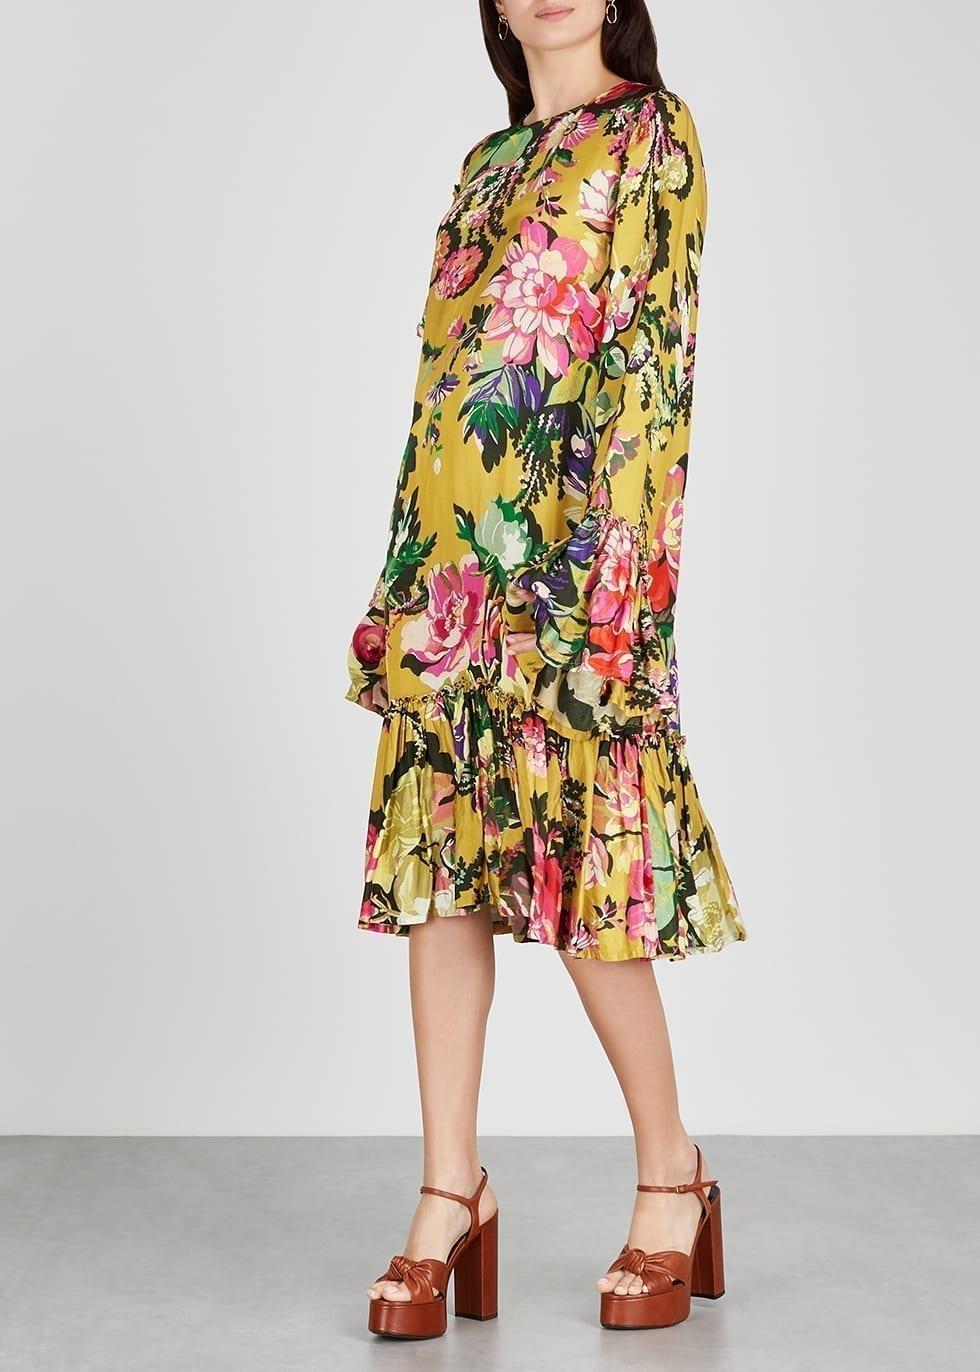 DRIES VAN NOTEN Dash Yellow Floral-print Satin Midi Dress